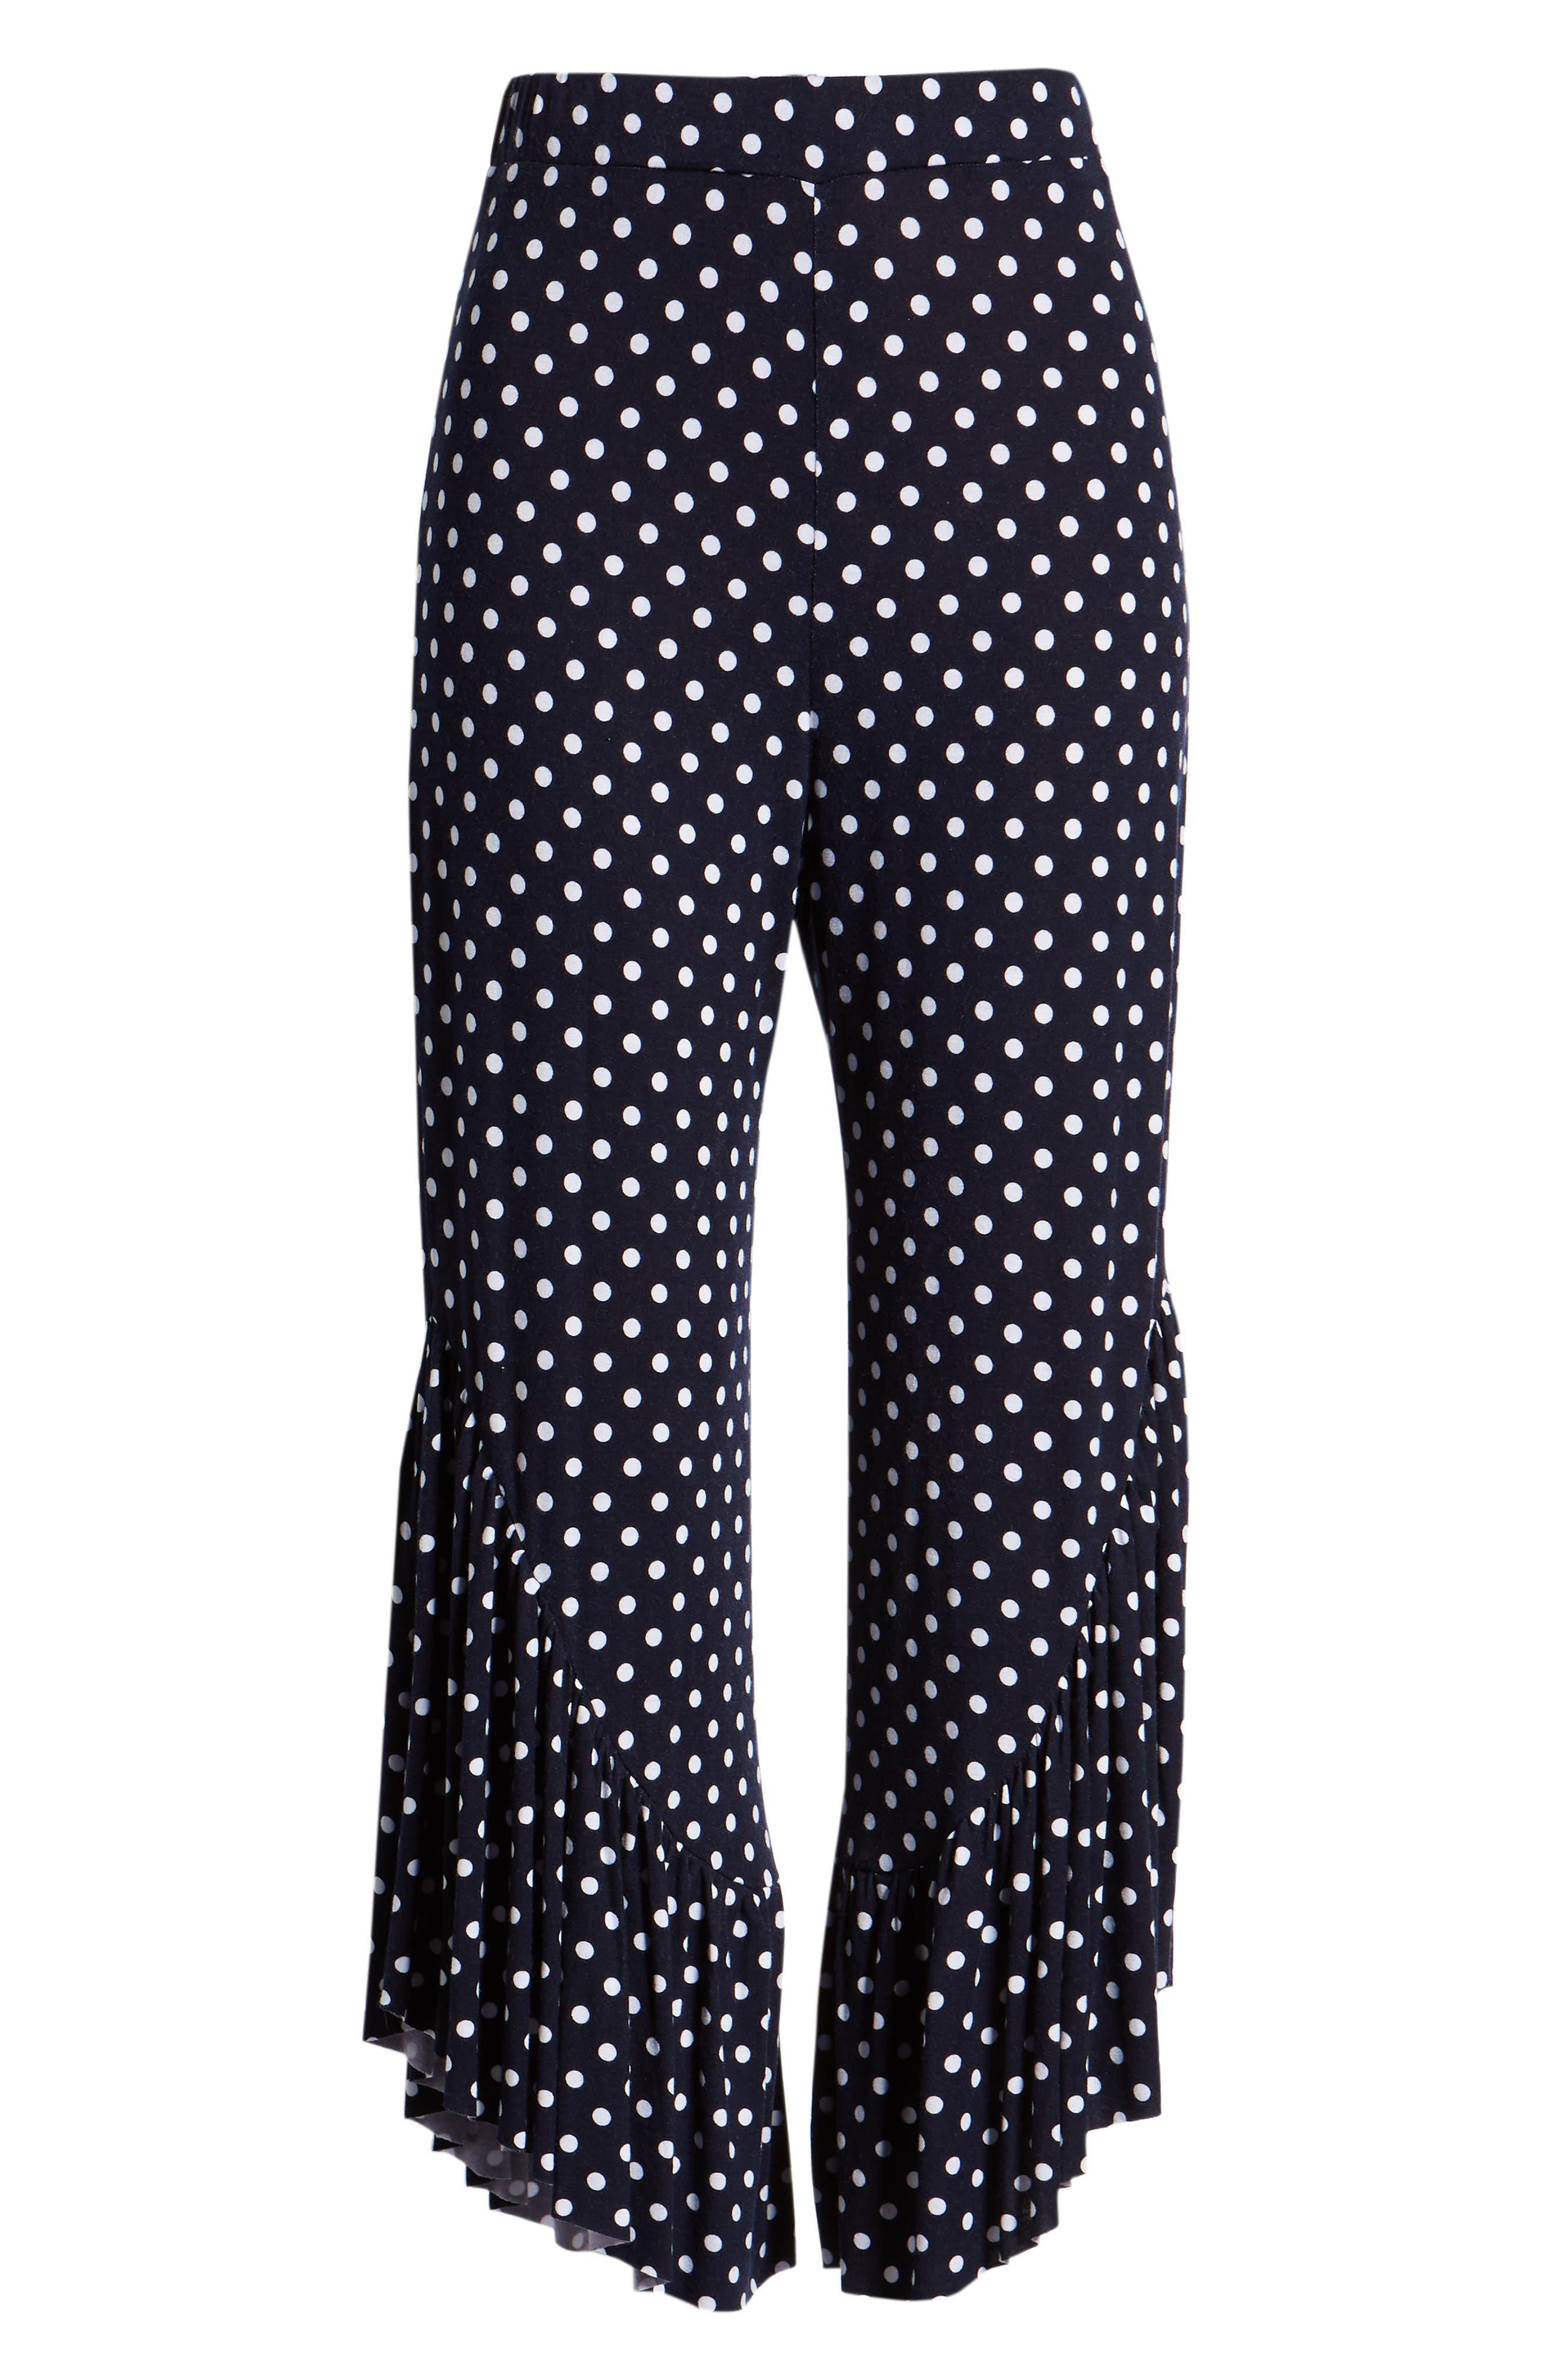 Ruffle Hem Wide Leg Crop Pants,                             Alternate thumbnail 7, color,                             Navy/ White Polka Dot